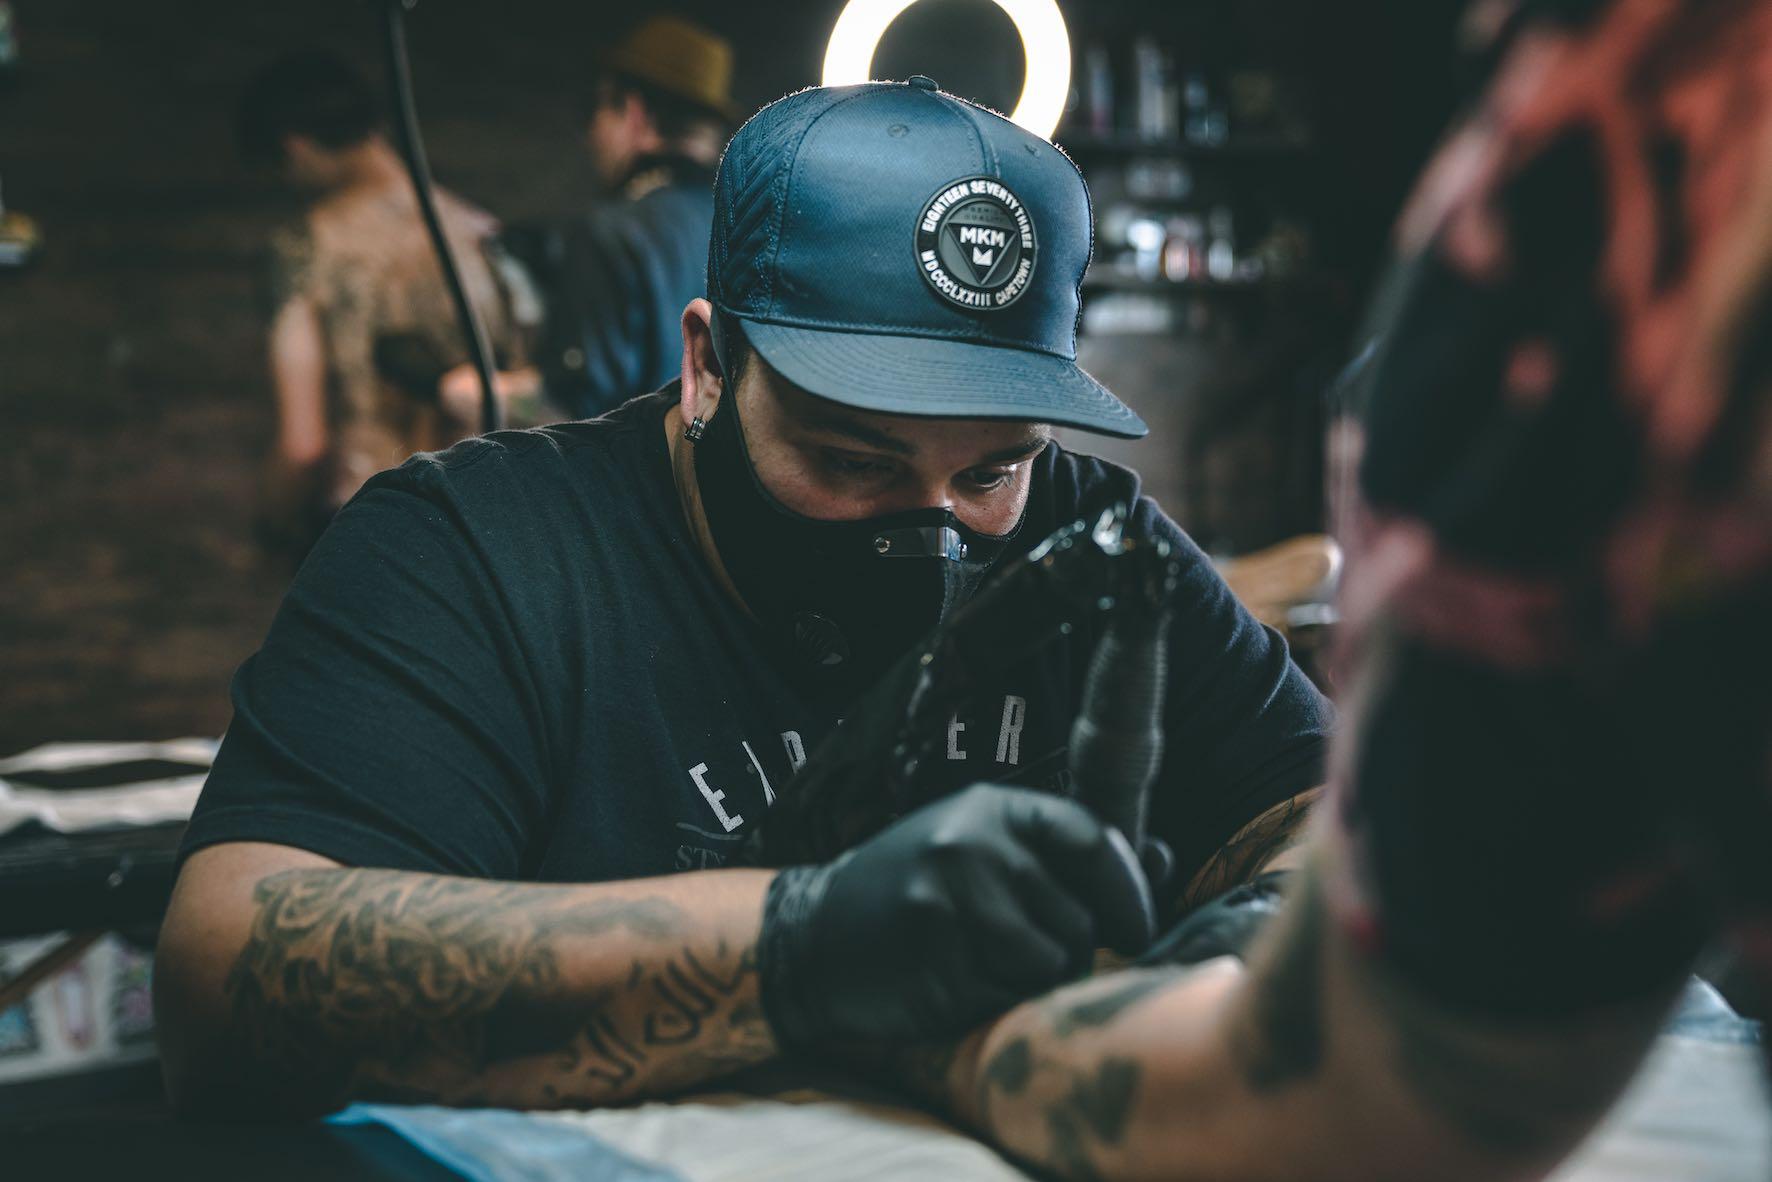 Interview with Tattoo Artist, Michael Palmer